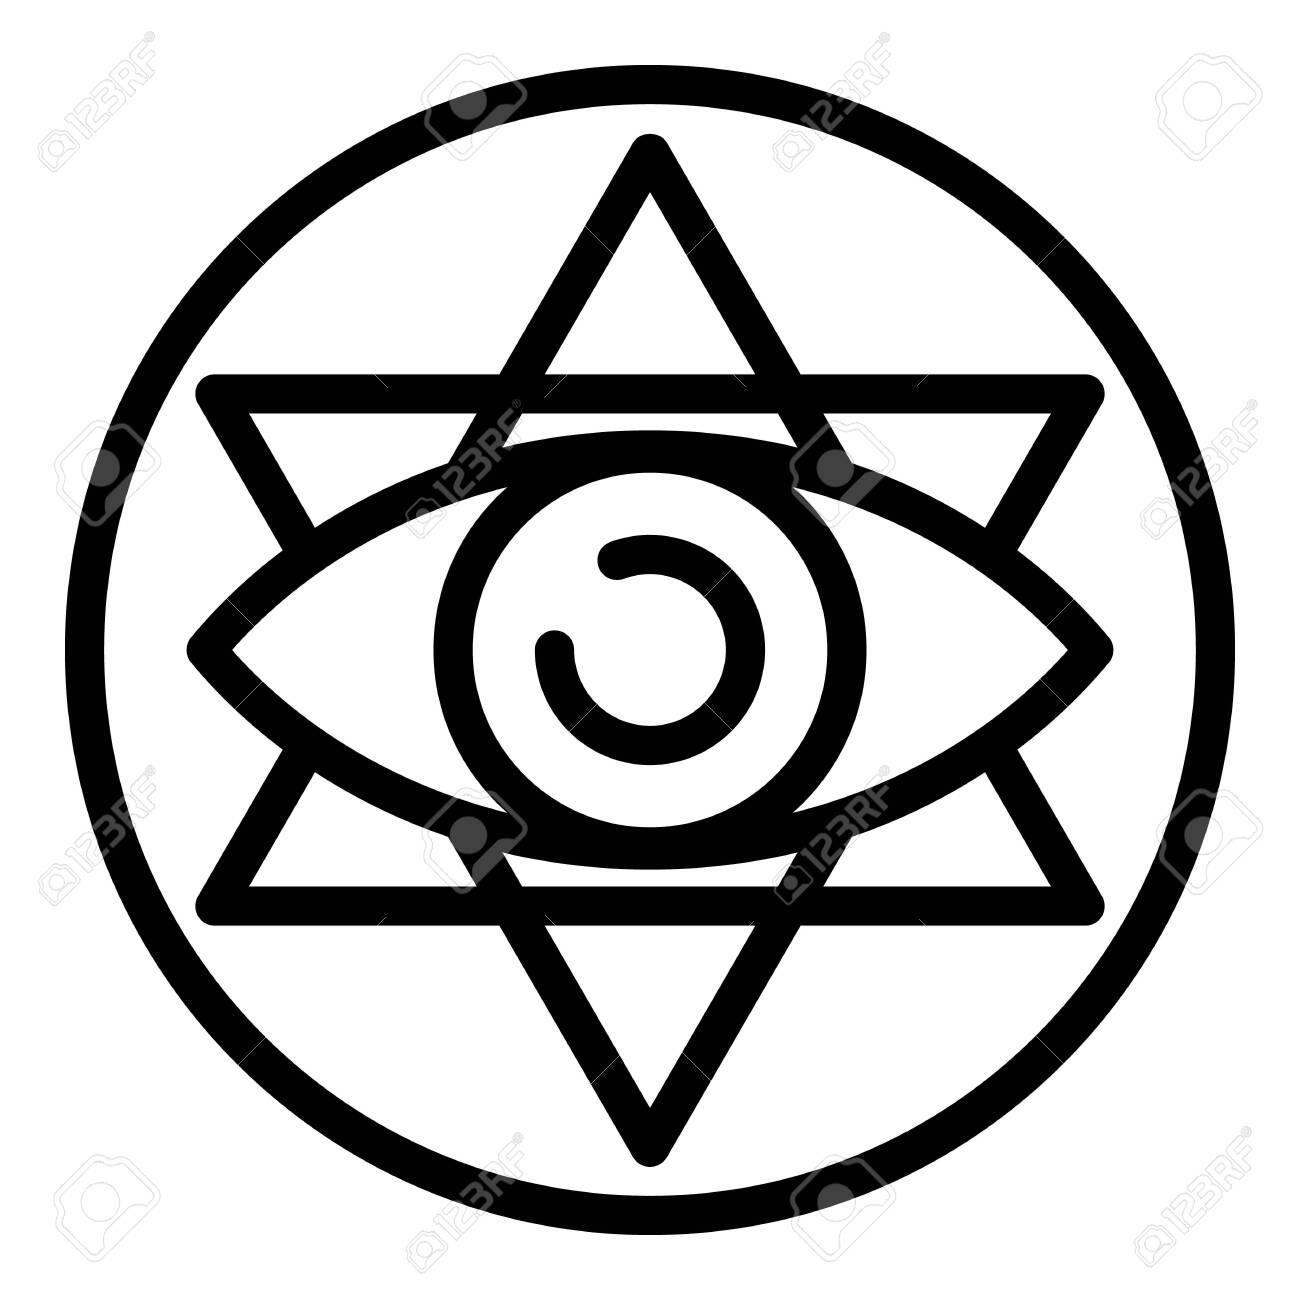 Eye alchemy emblem icon, outline style - 129981345